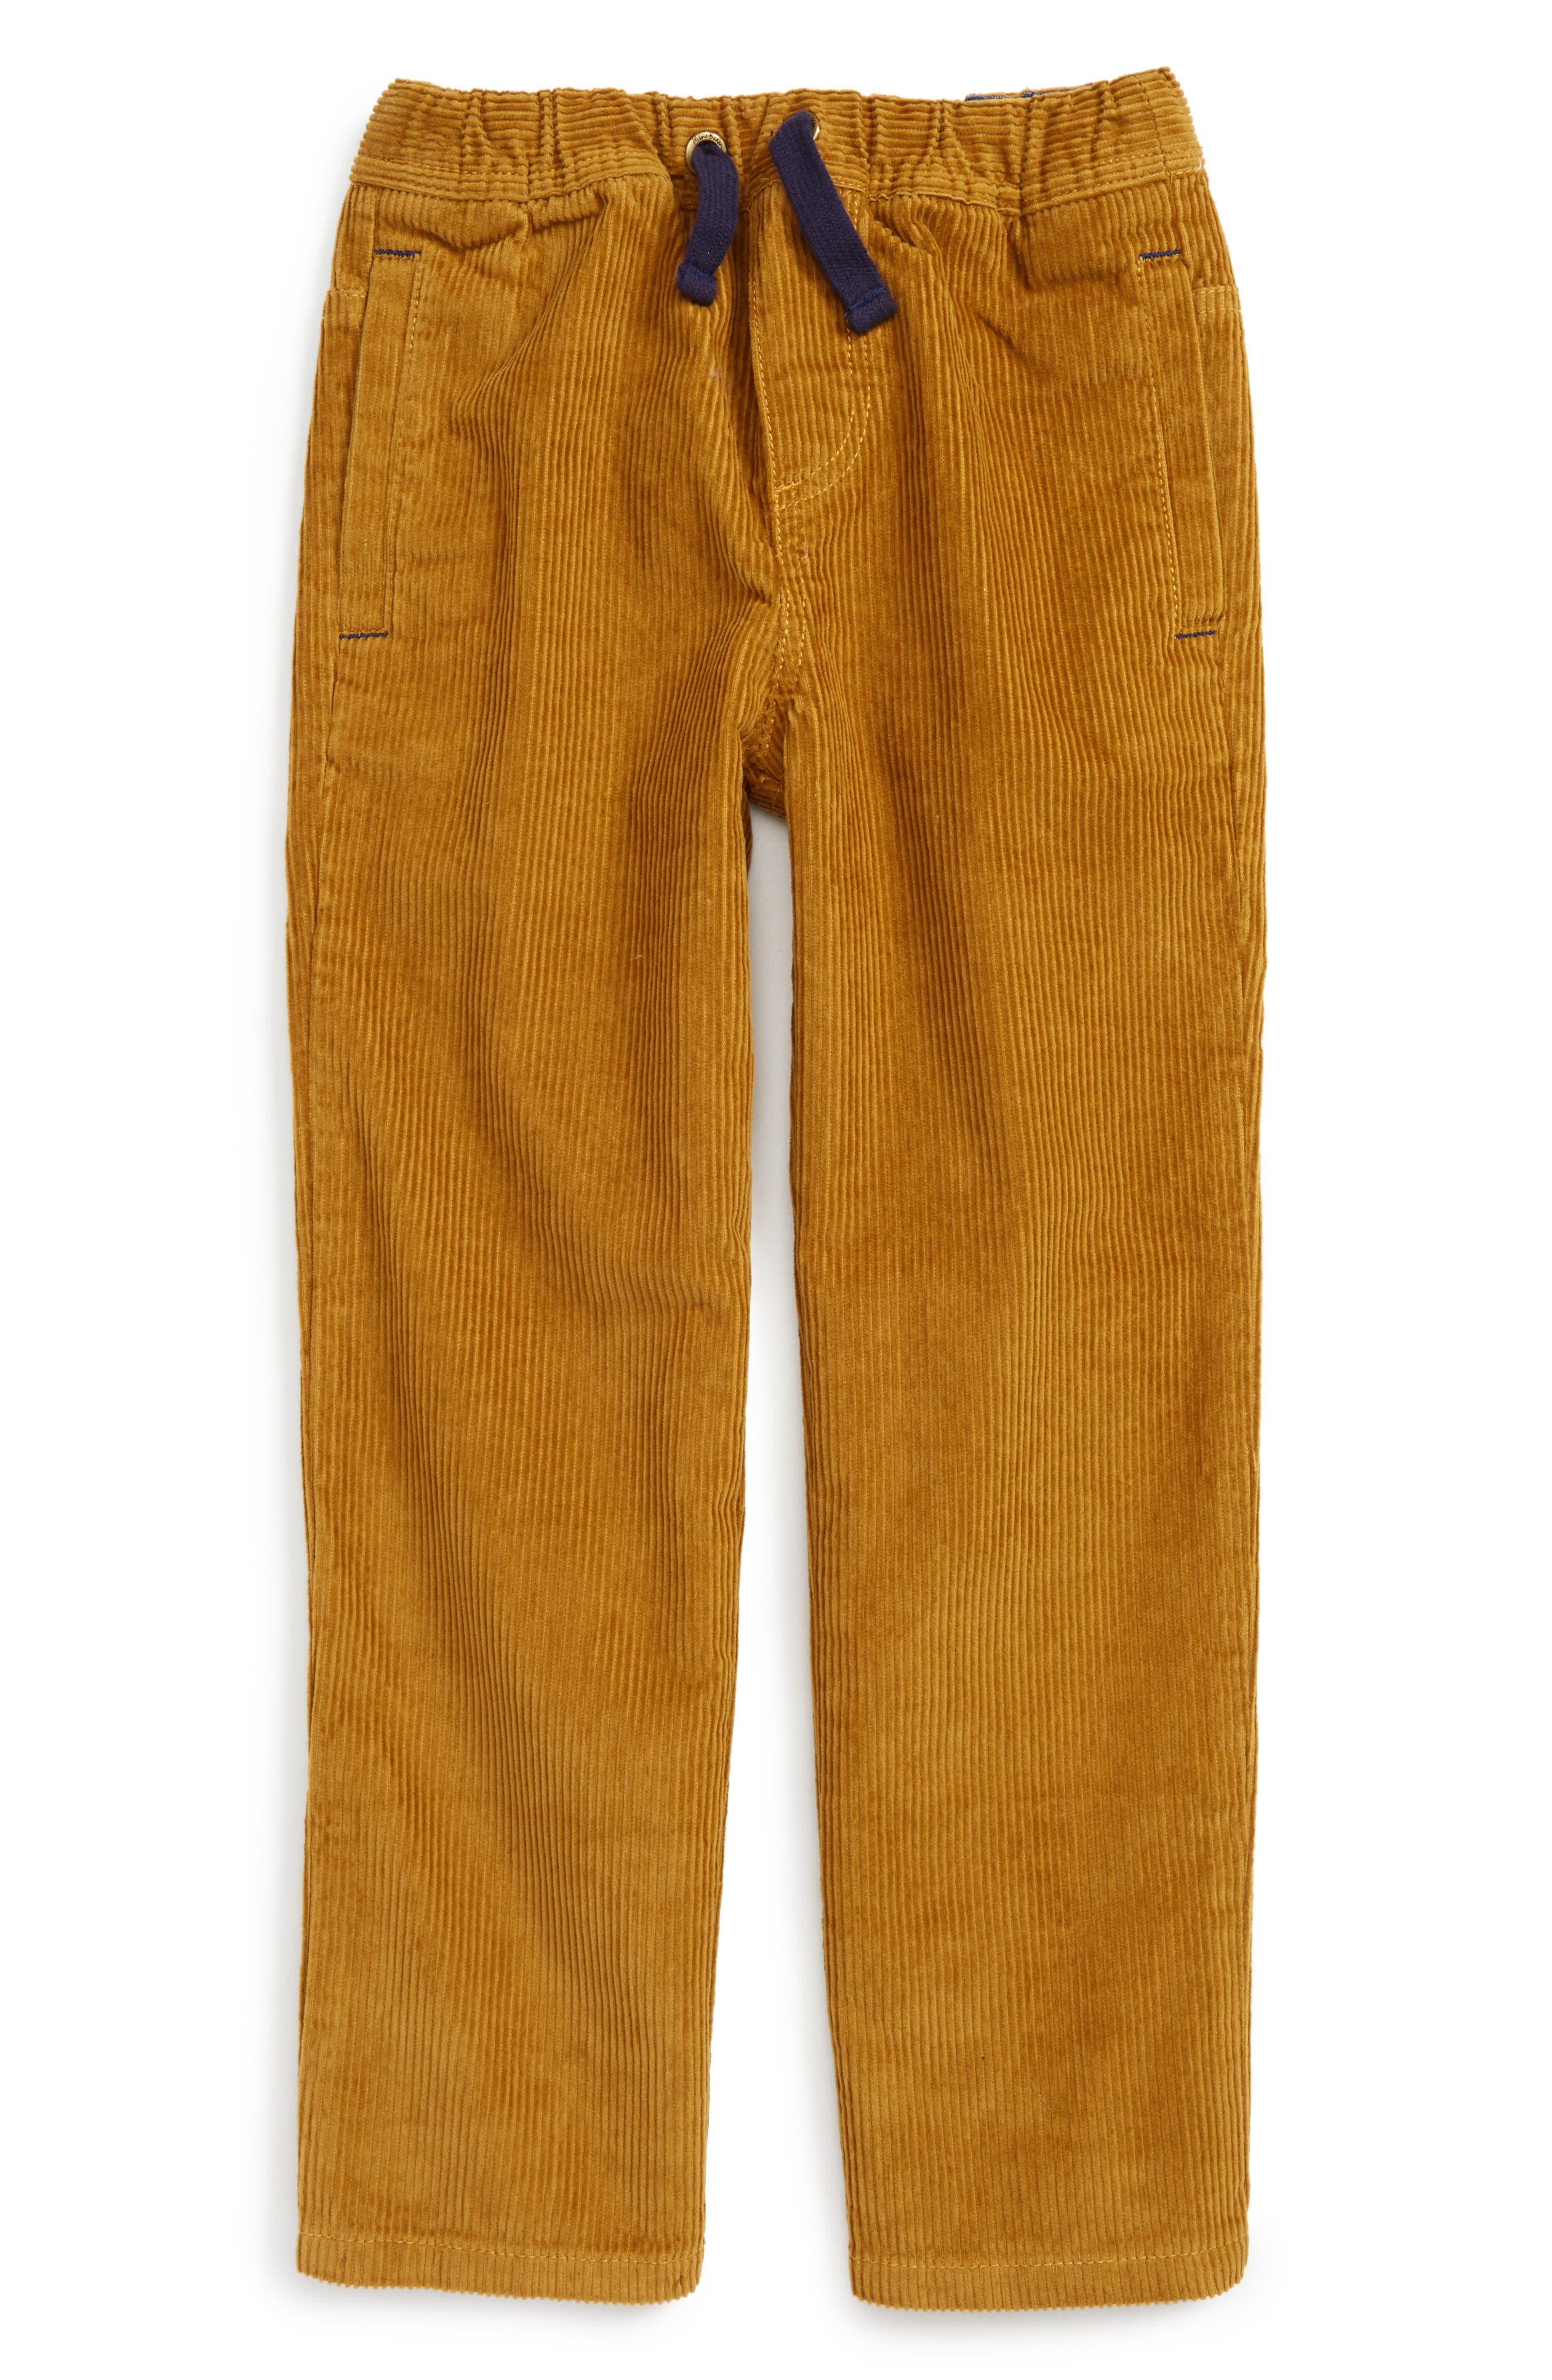 Main Image - Mini Boden Corduroy Pants (Toddler Boys, Little Boys & Big Boys)